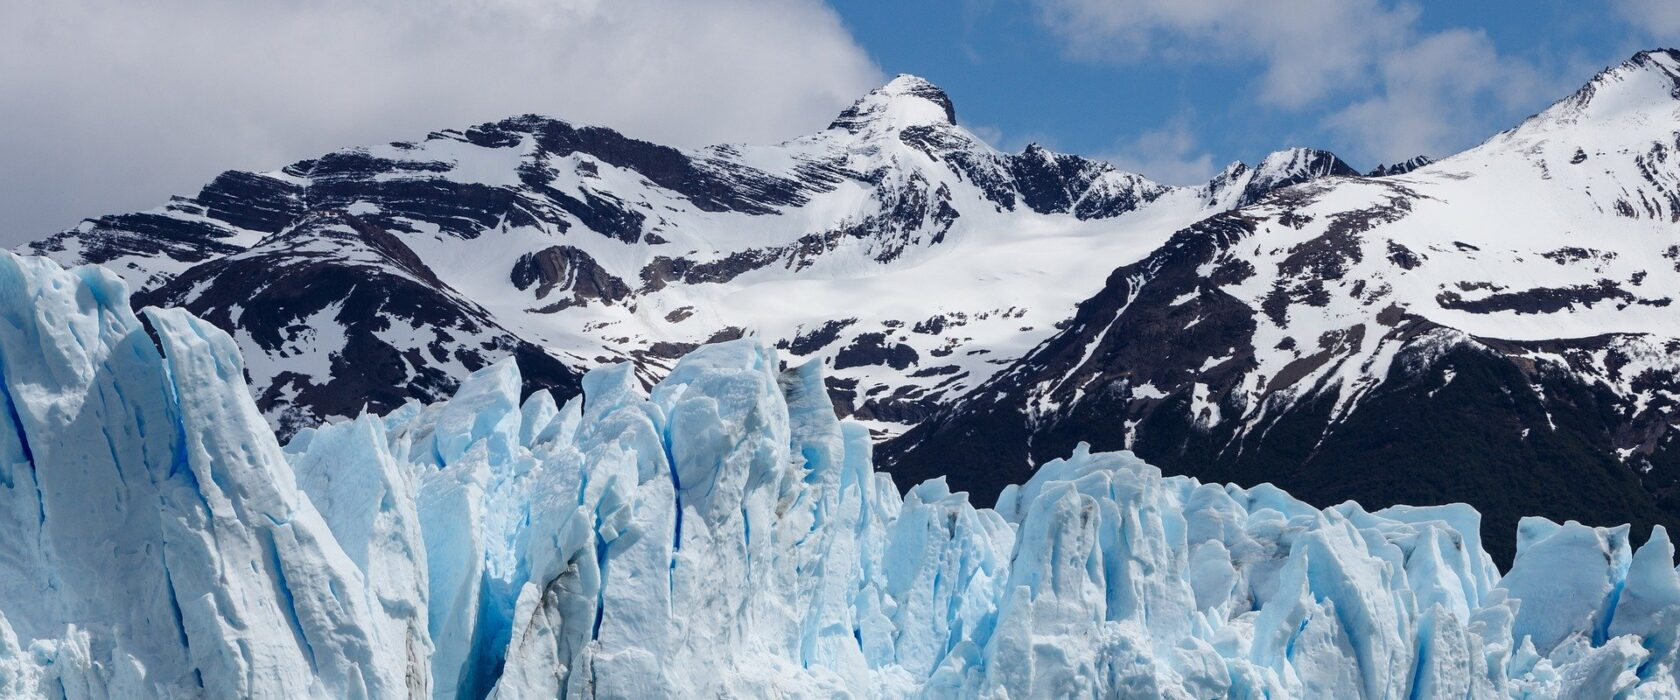 alpen berg ski